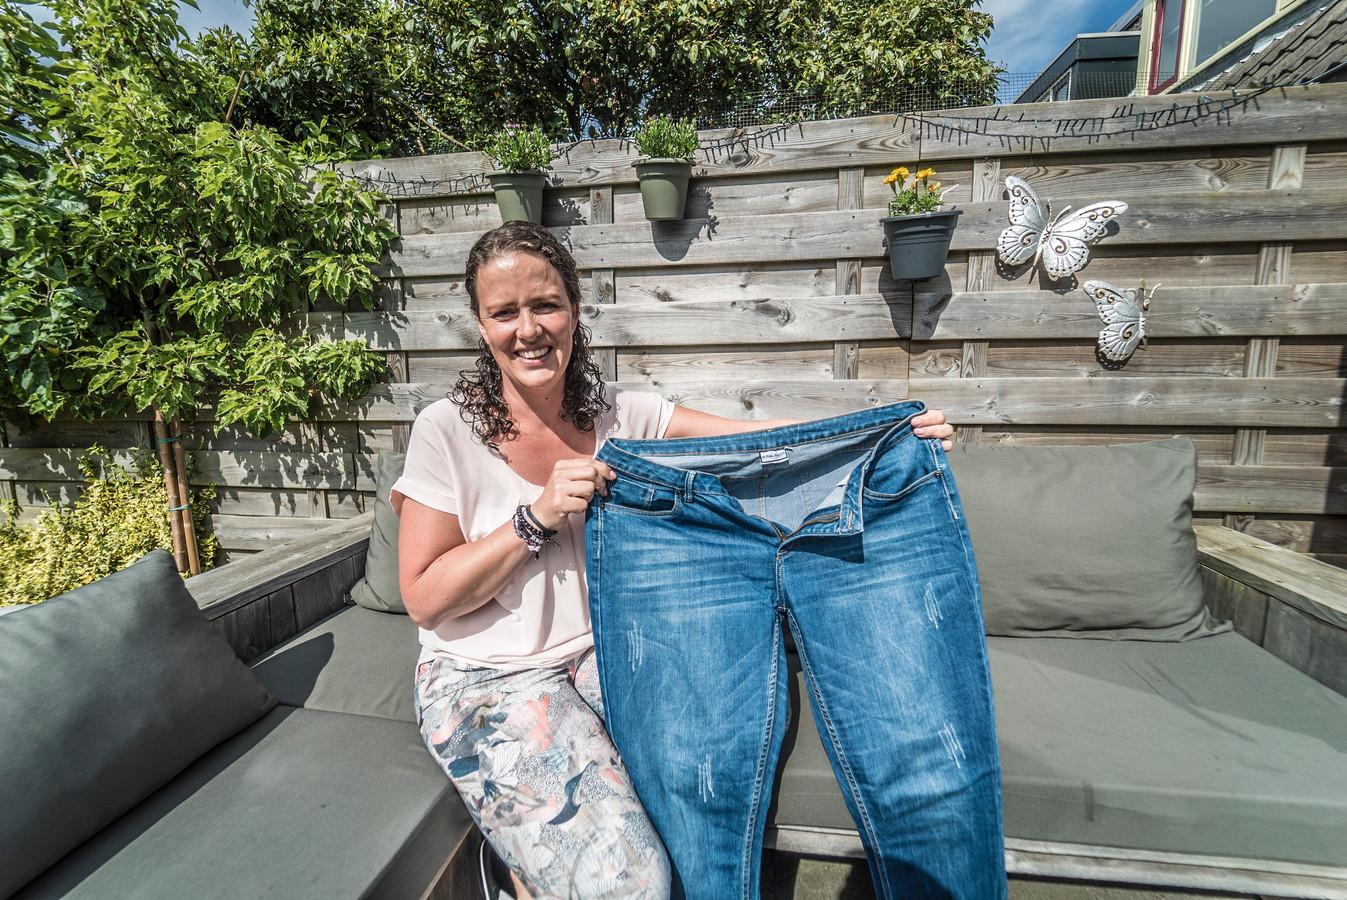 Jerney Nieuwets is 23 kilo kwijt.